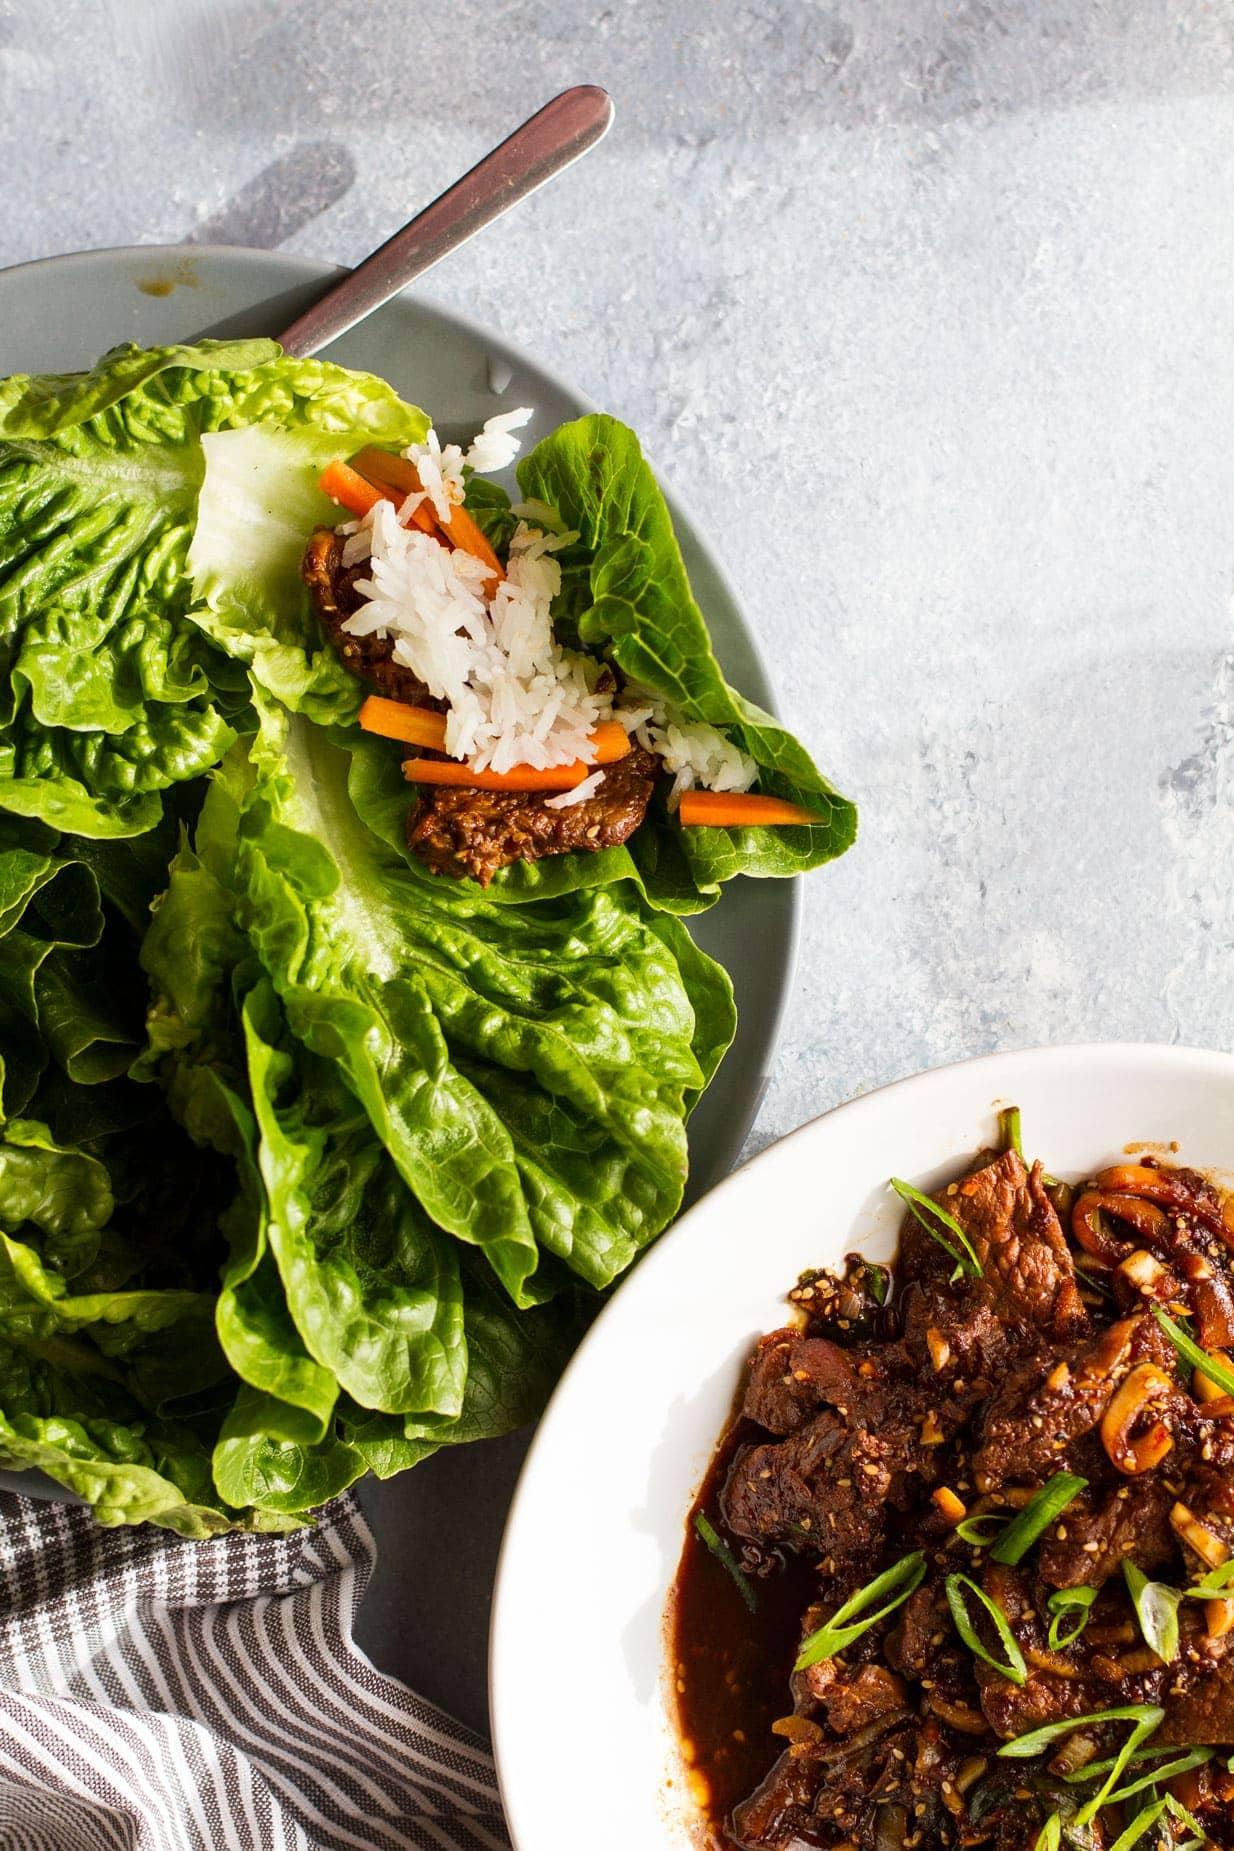 Beef bulgogi ingredients, flatlay.